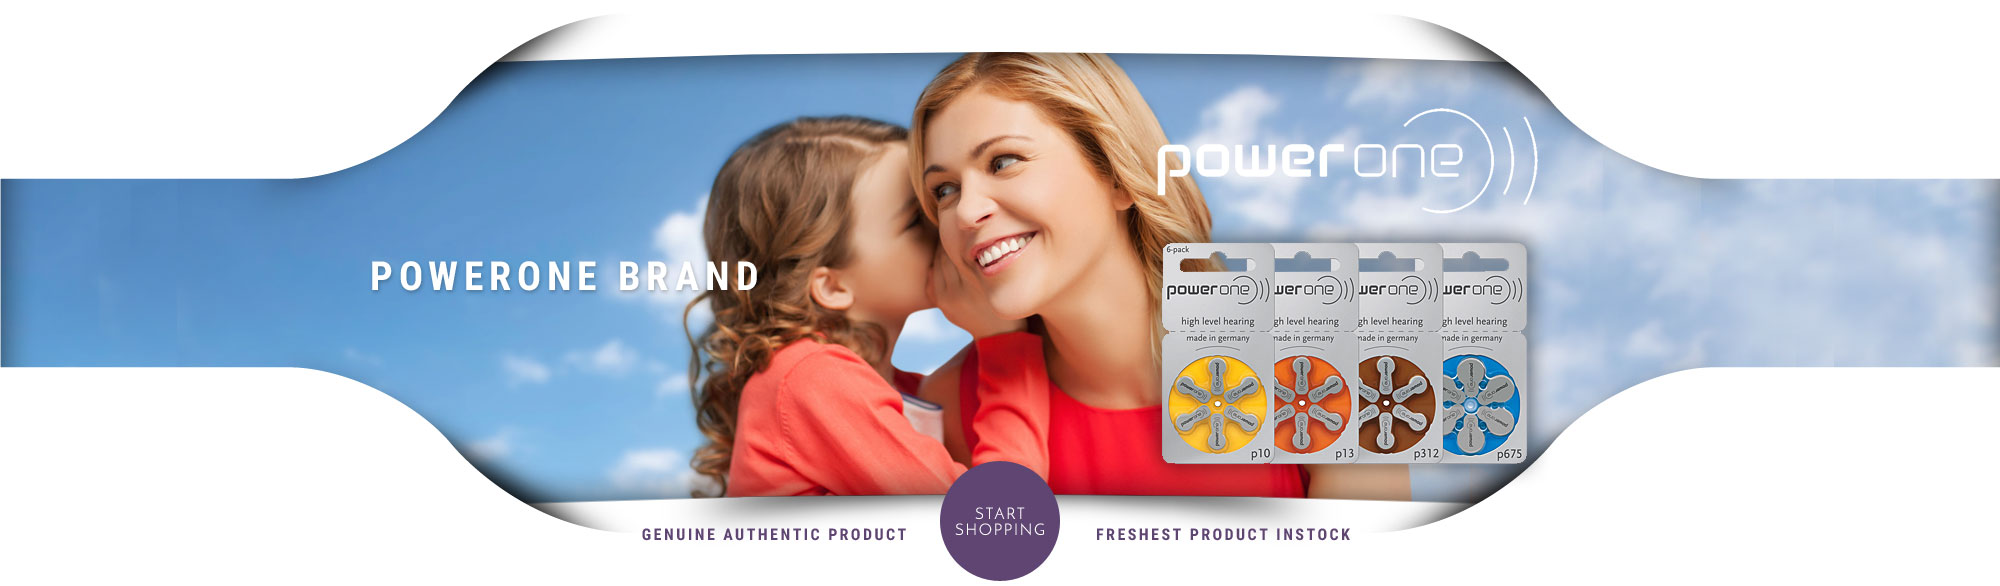 Powerone brand - Genuine Authentic Product - Freshest Product Instock  - start shopping